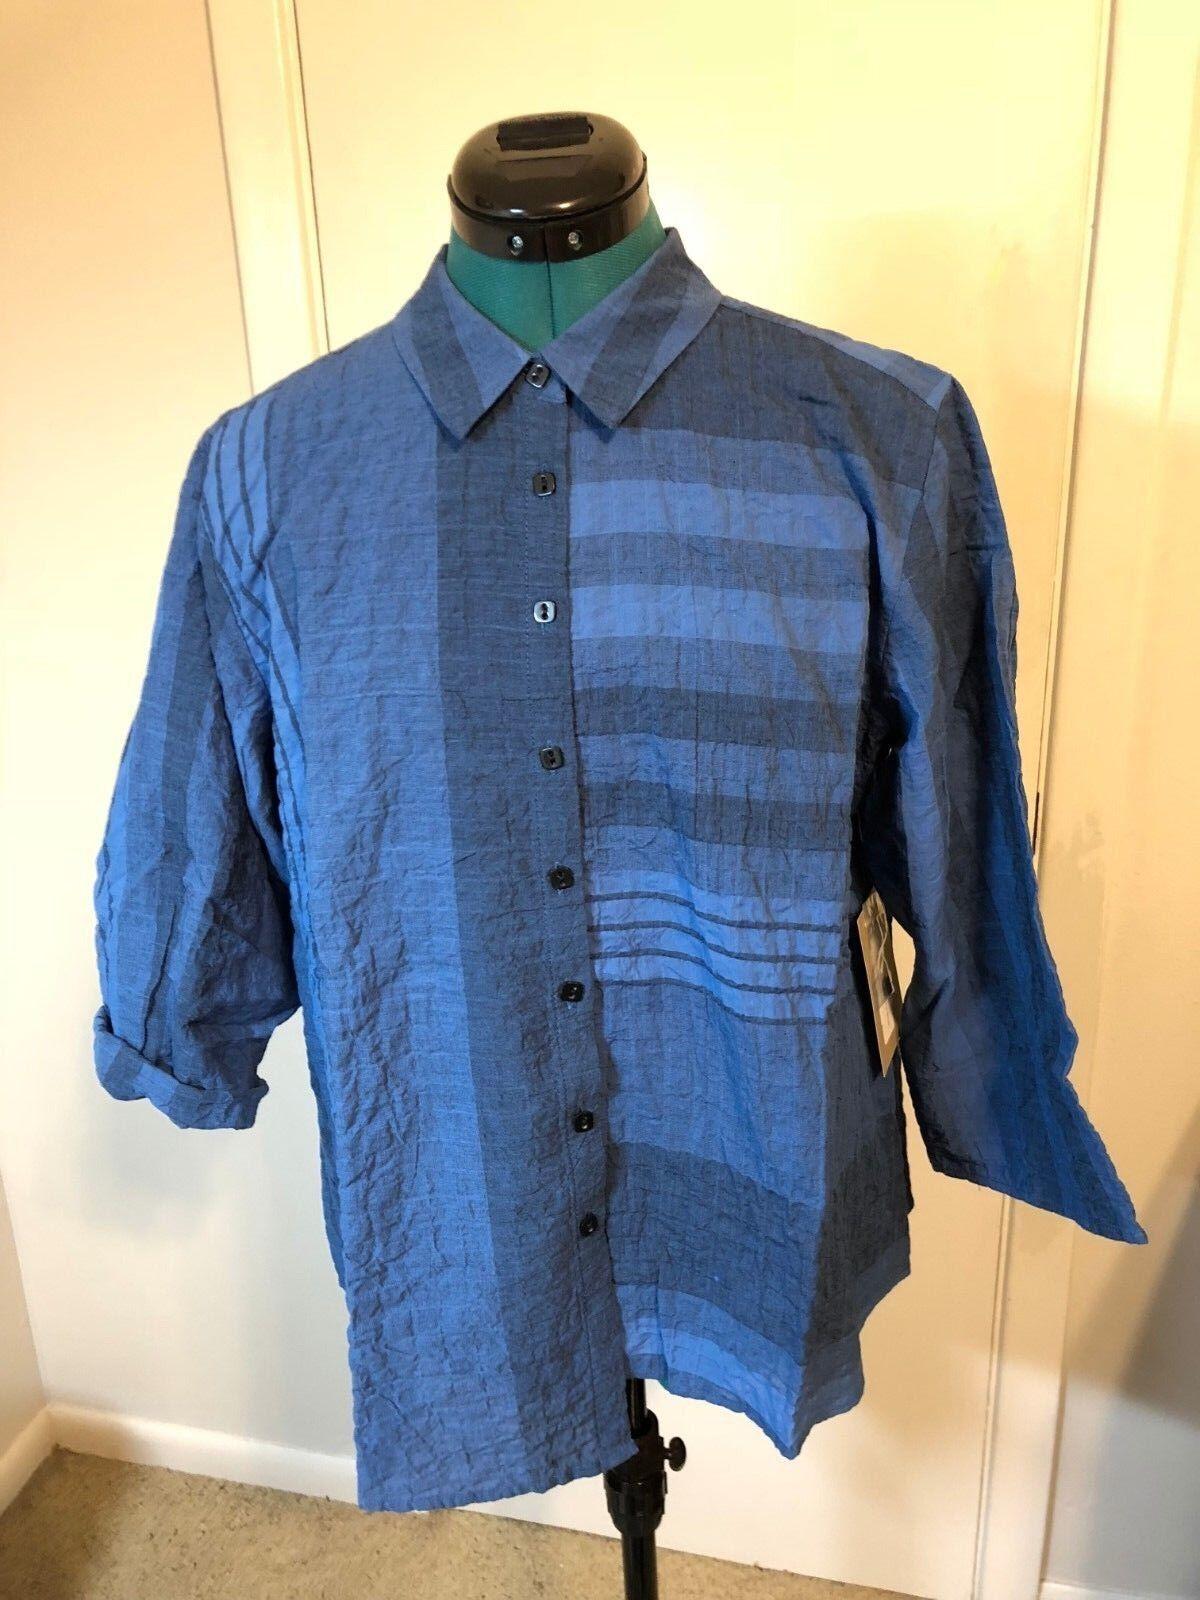 Habitat Evening Blau striped shirt.Größe S.NWT.